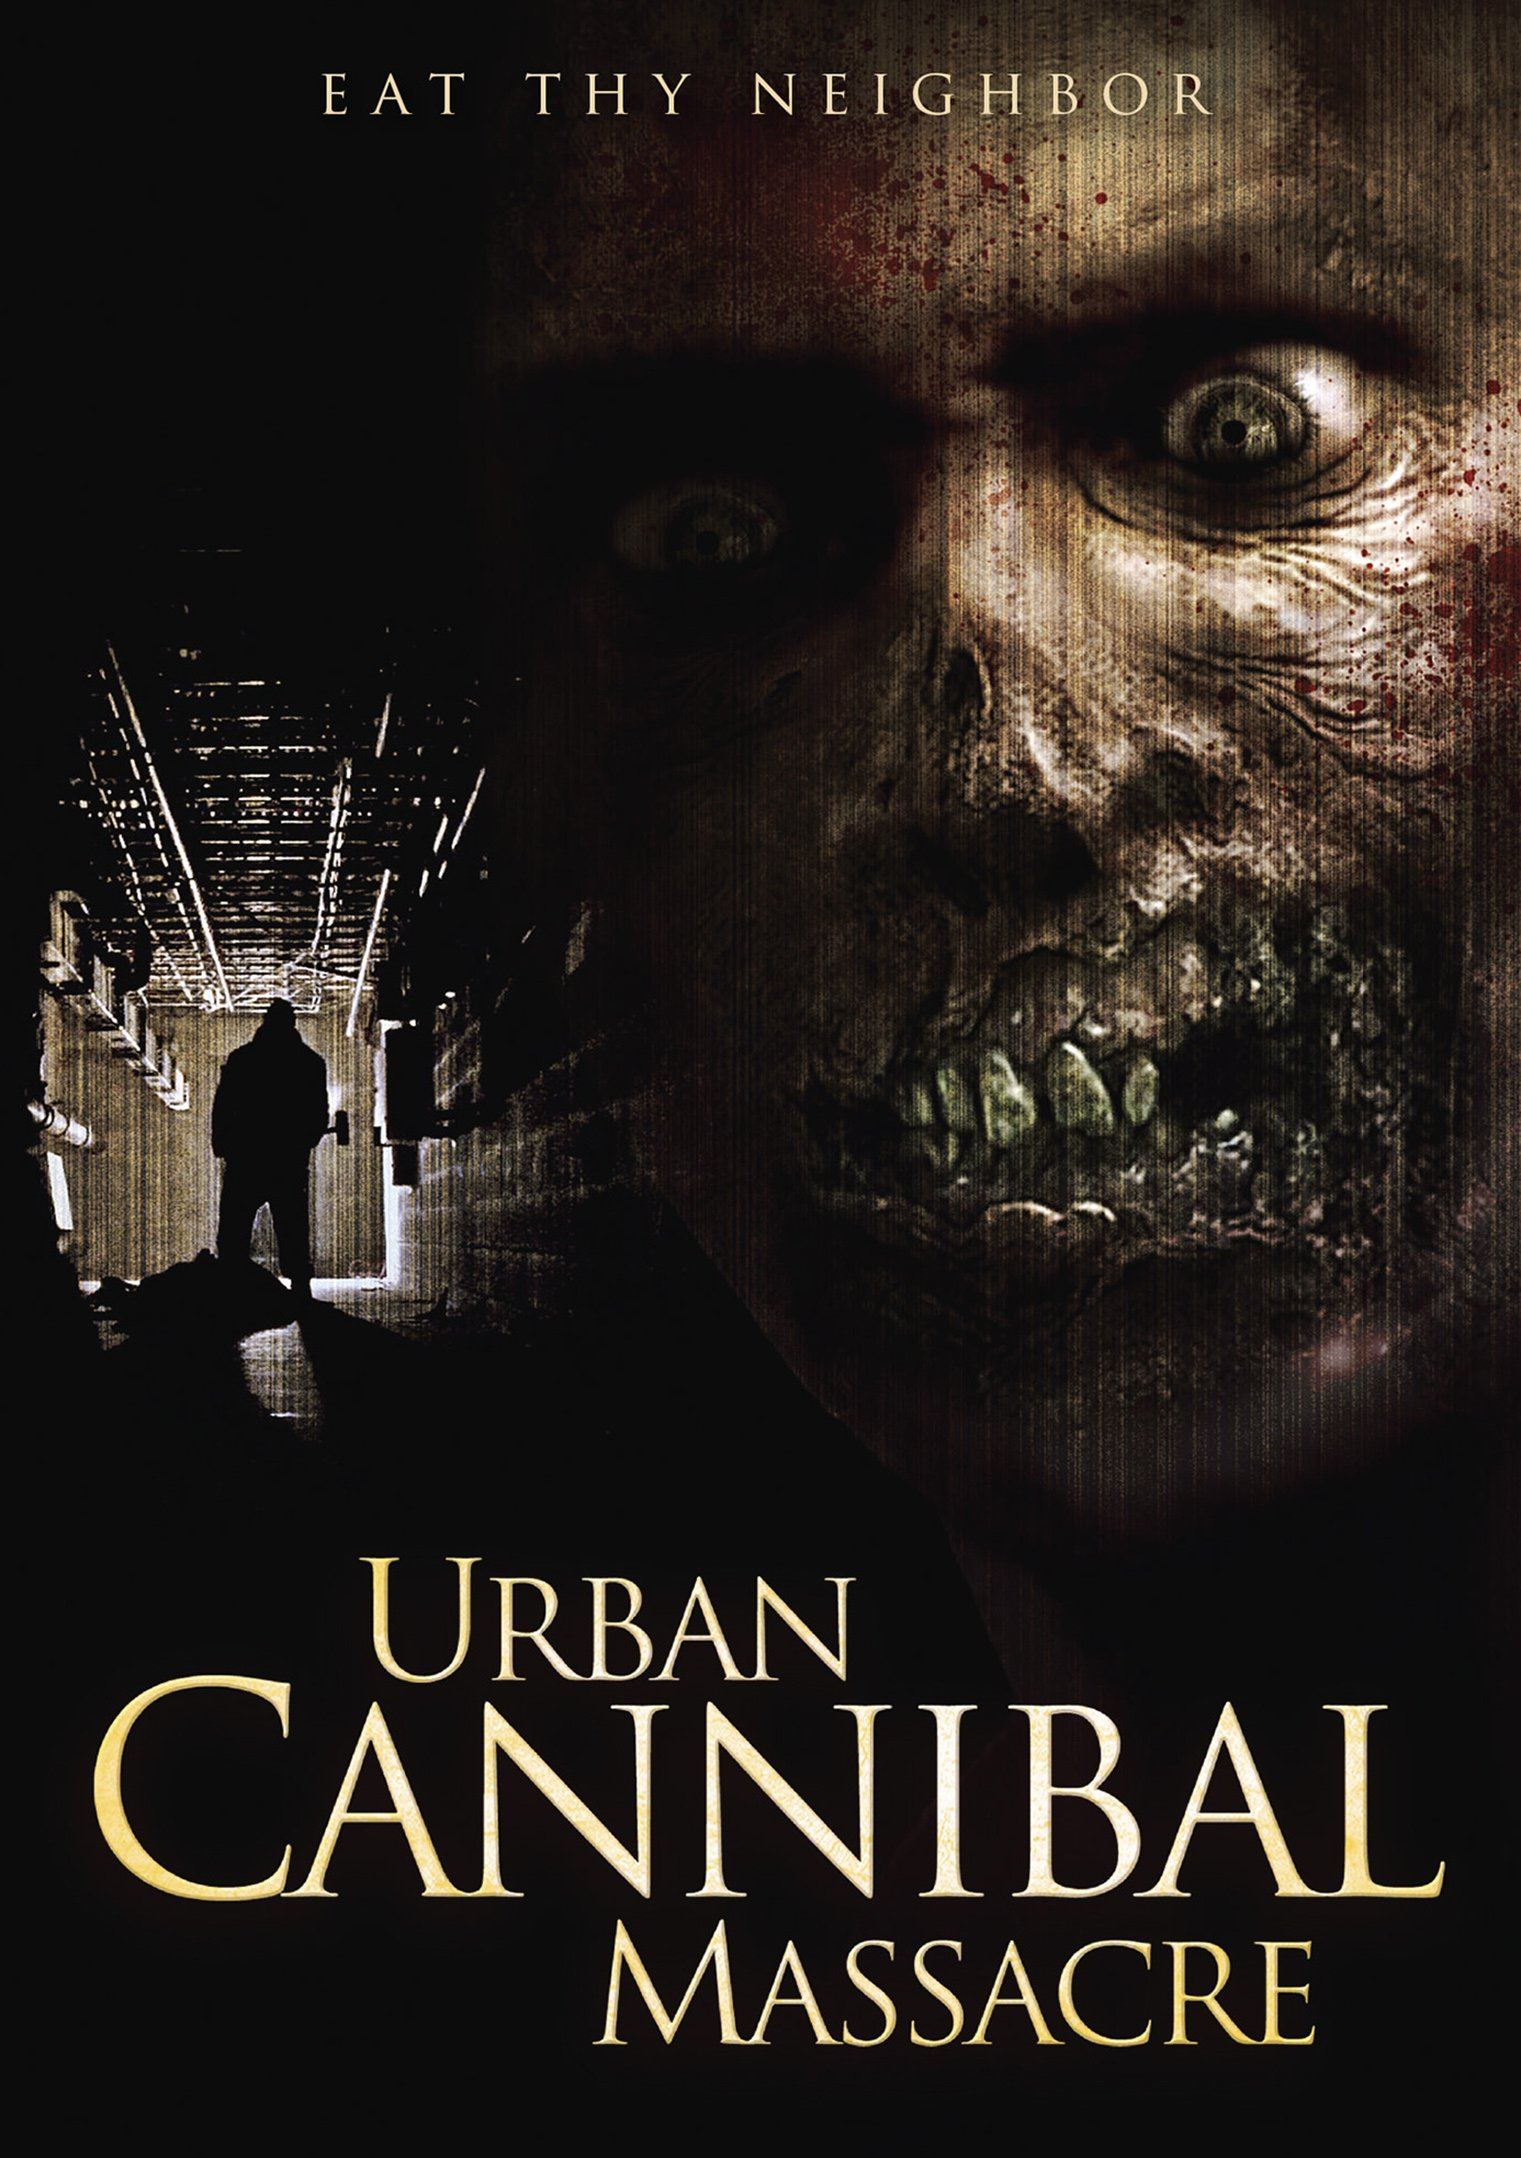 Urban Cannibal Massacre (2013) - IMDb